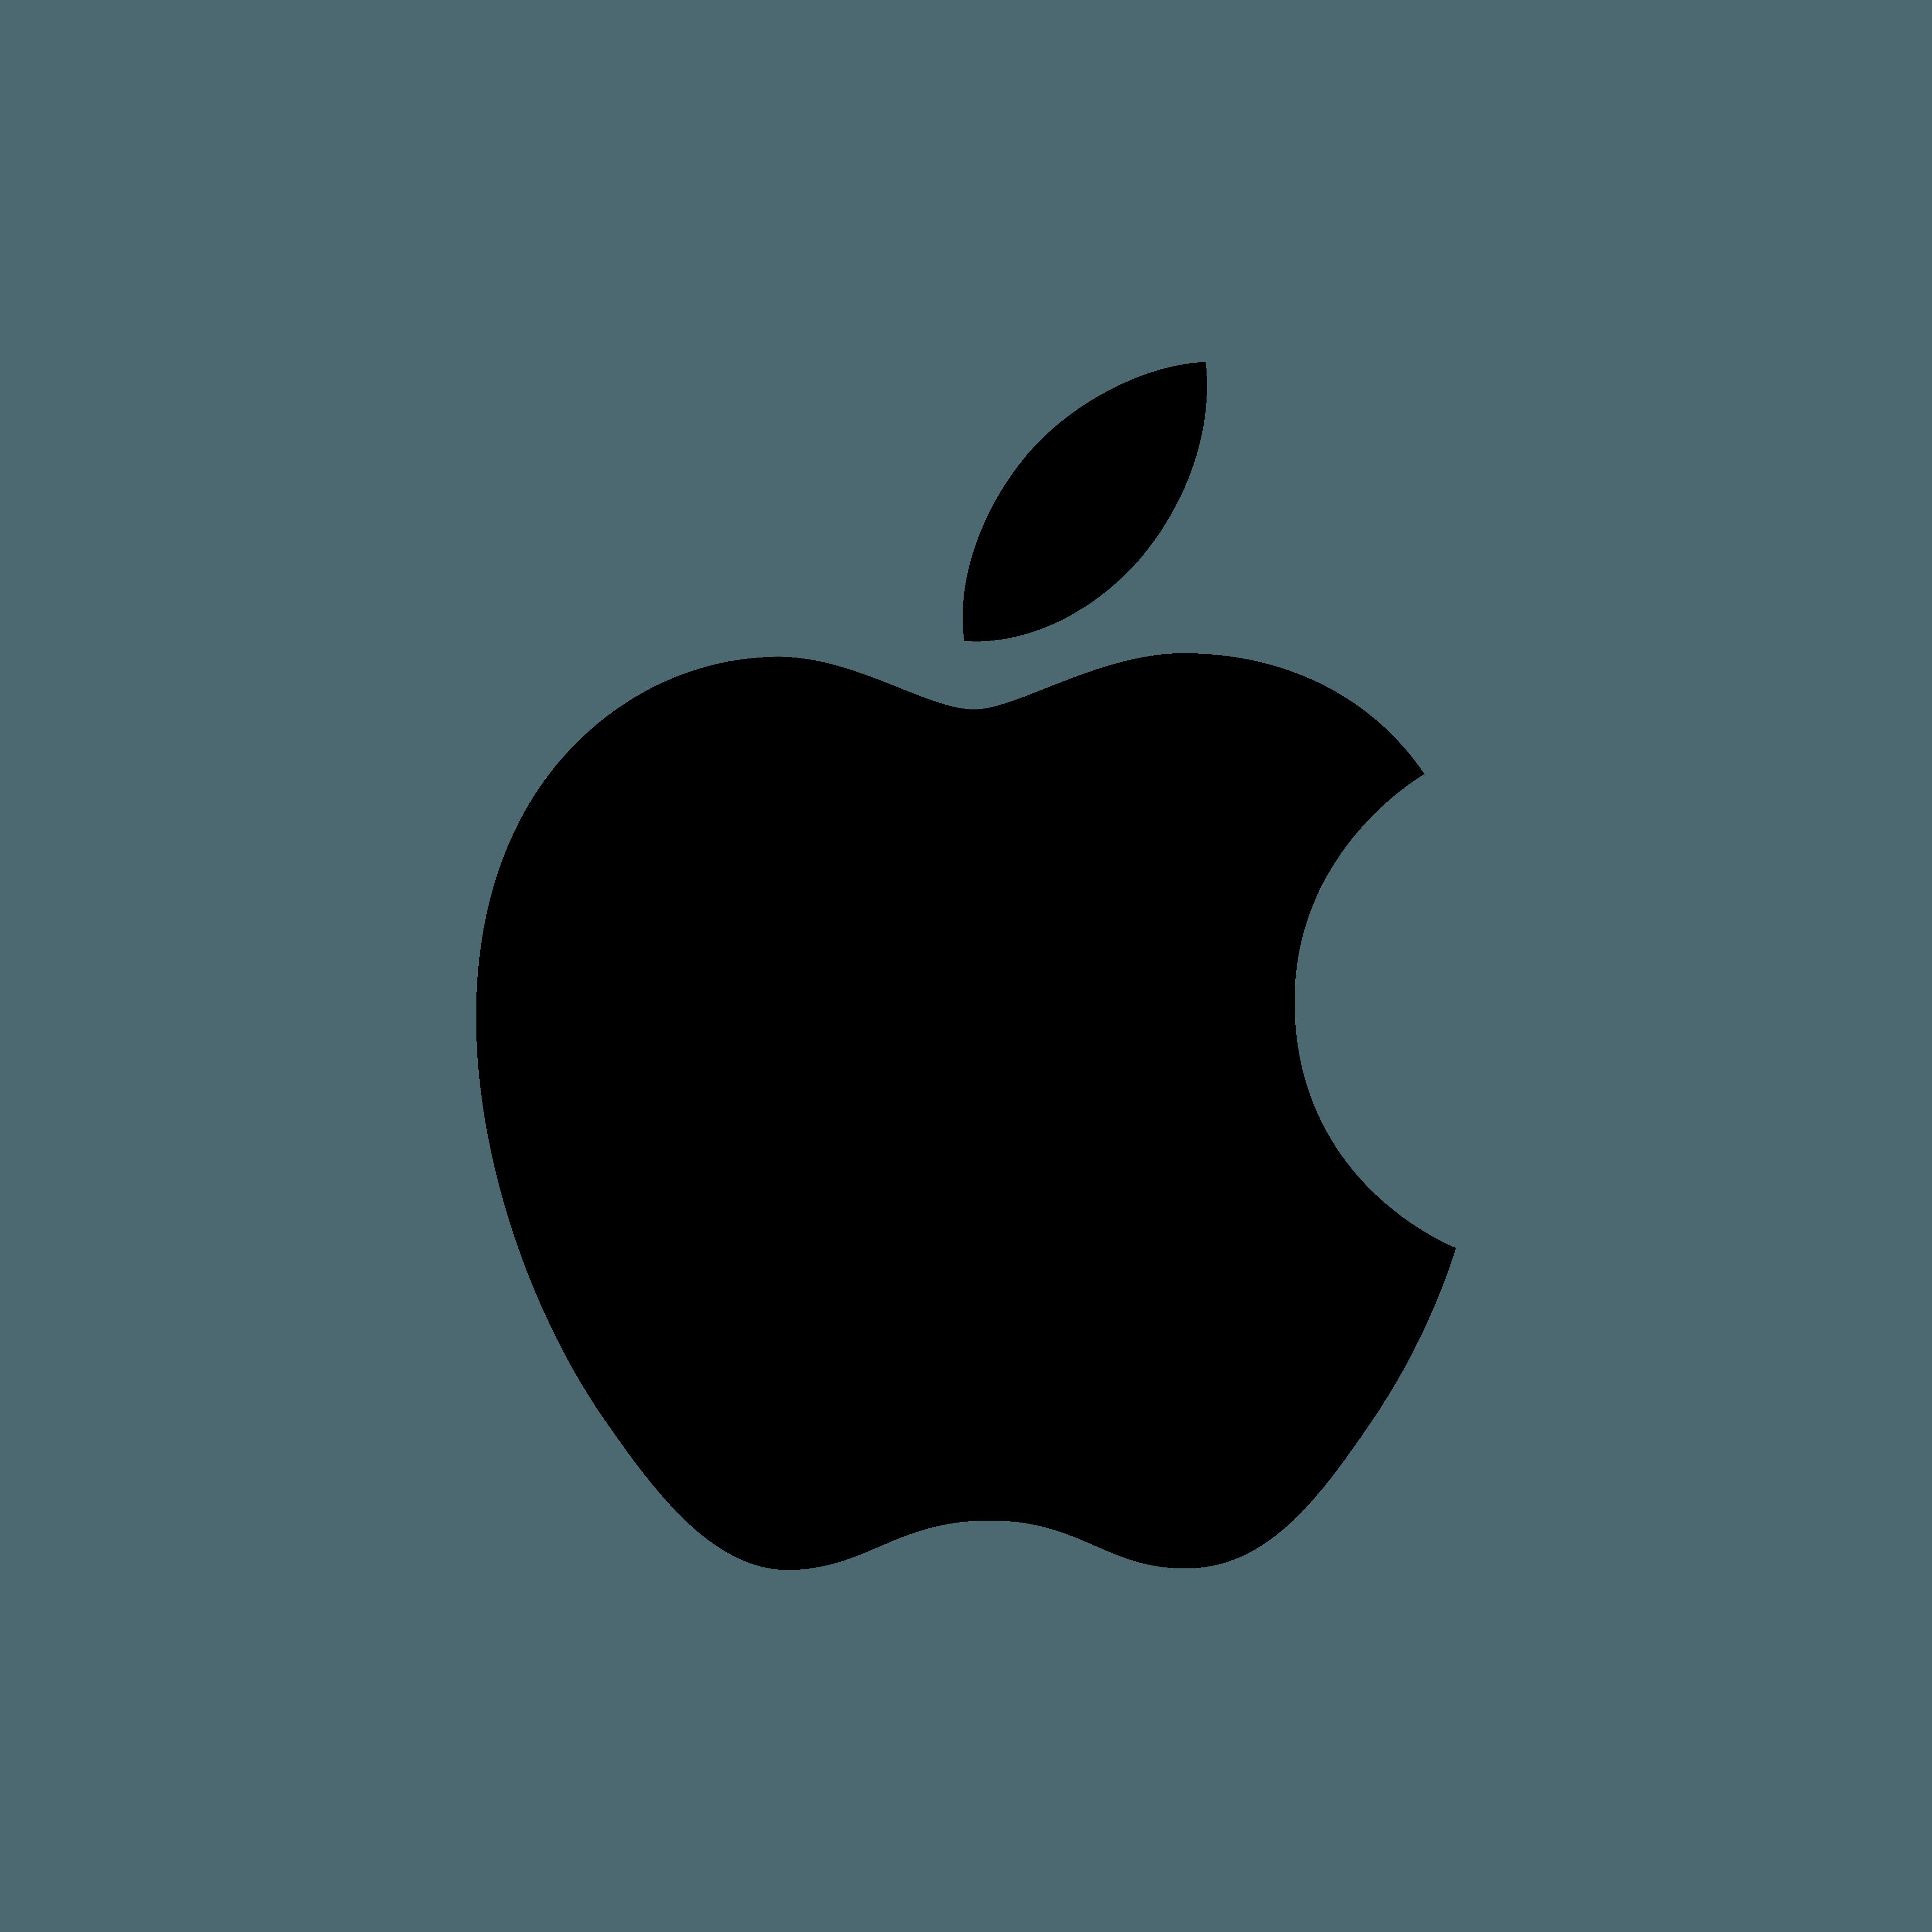 Download for free 10 PNG Original apple logo high